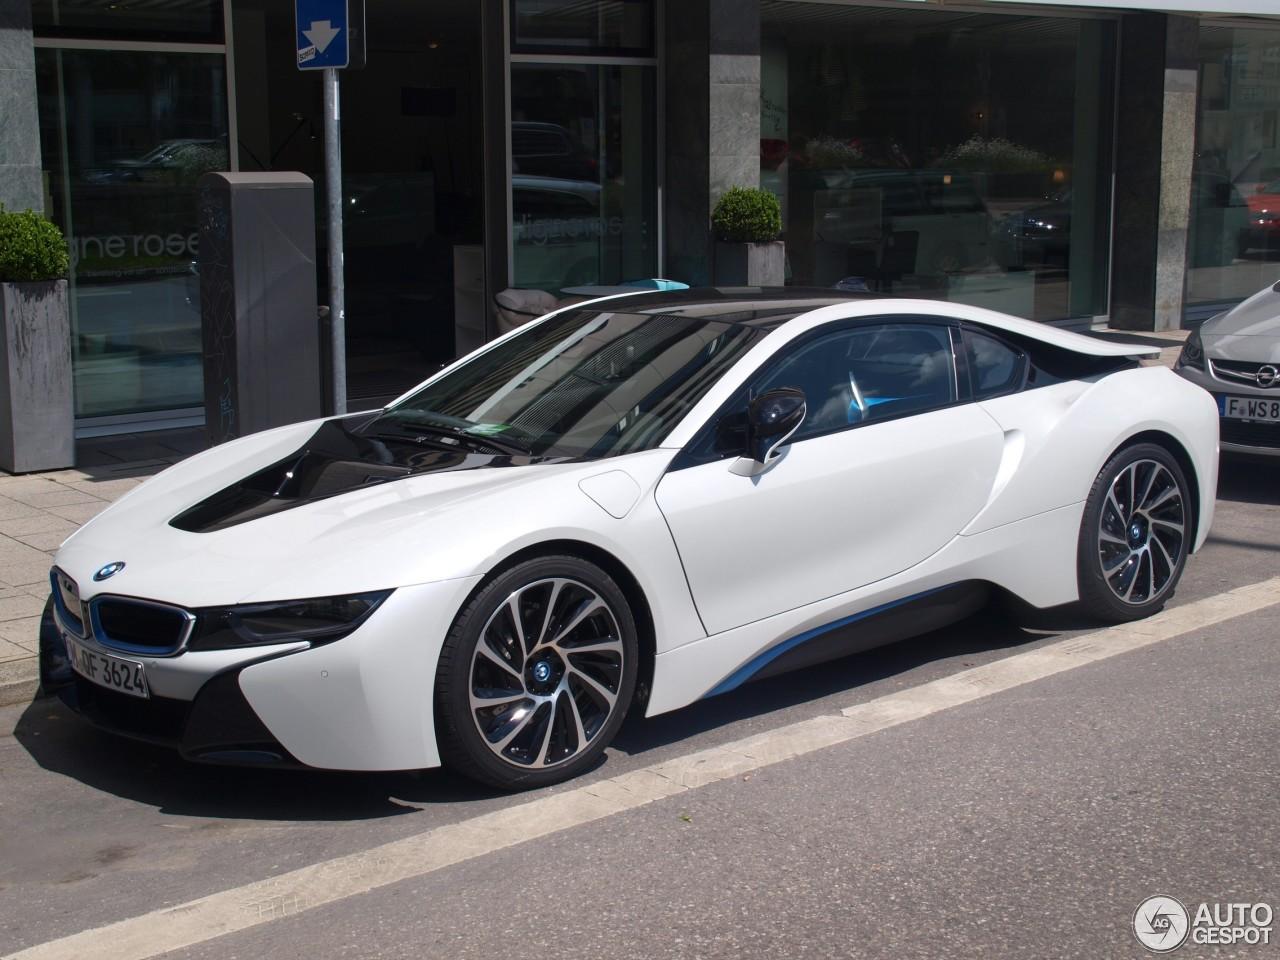 Bmw I8 Pink >> BMW i8 - 31 May 2014 - Autogespot